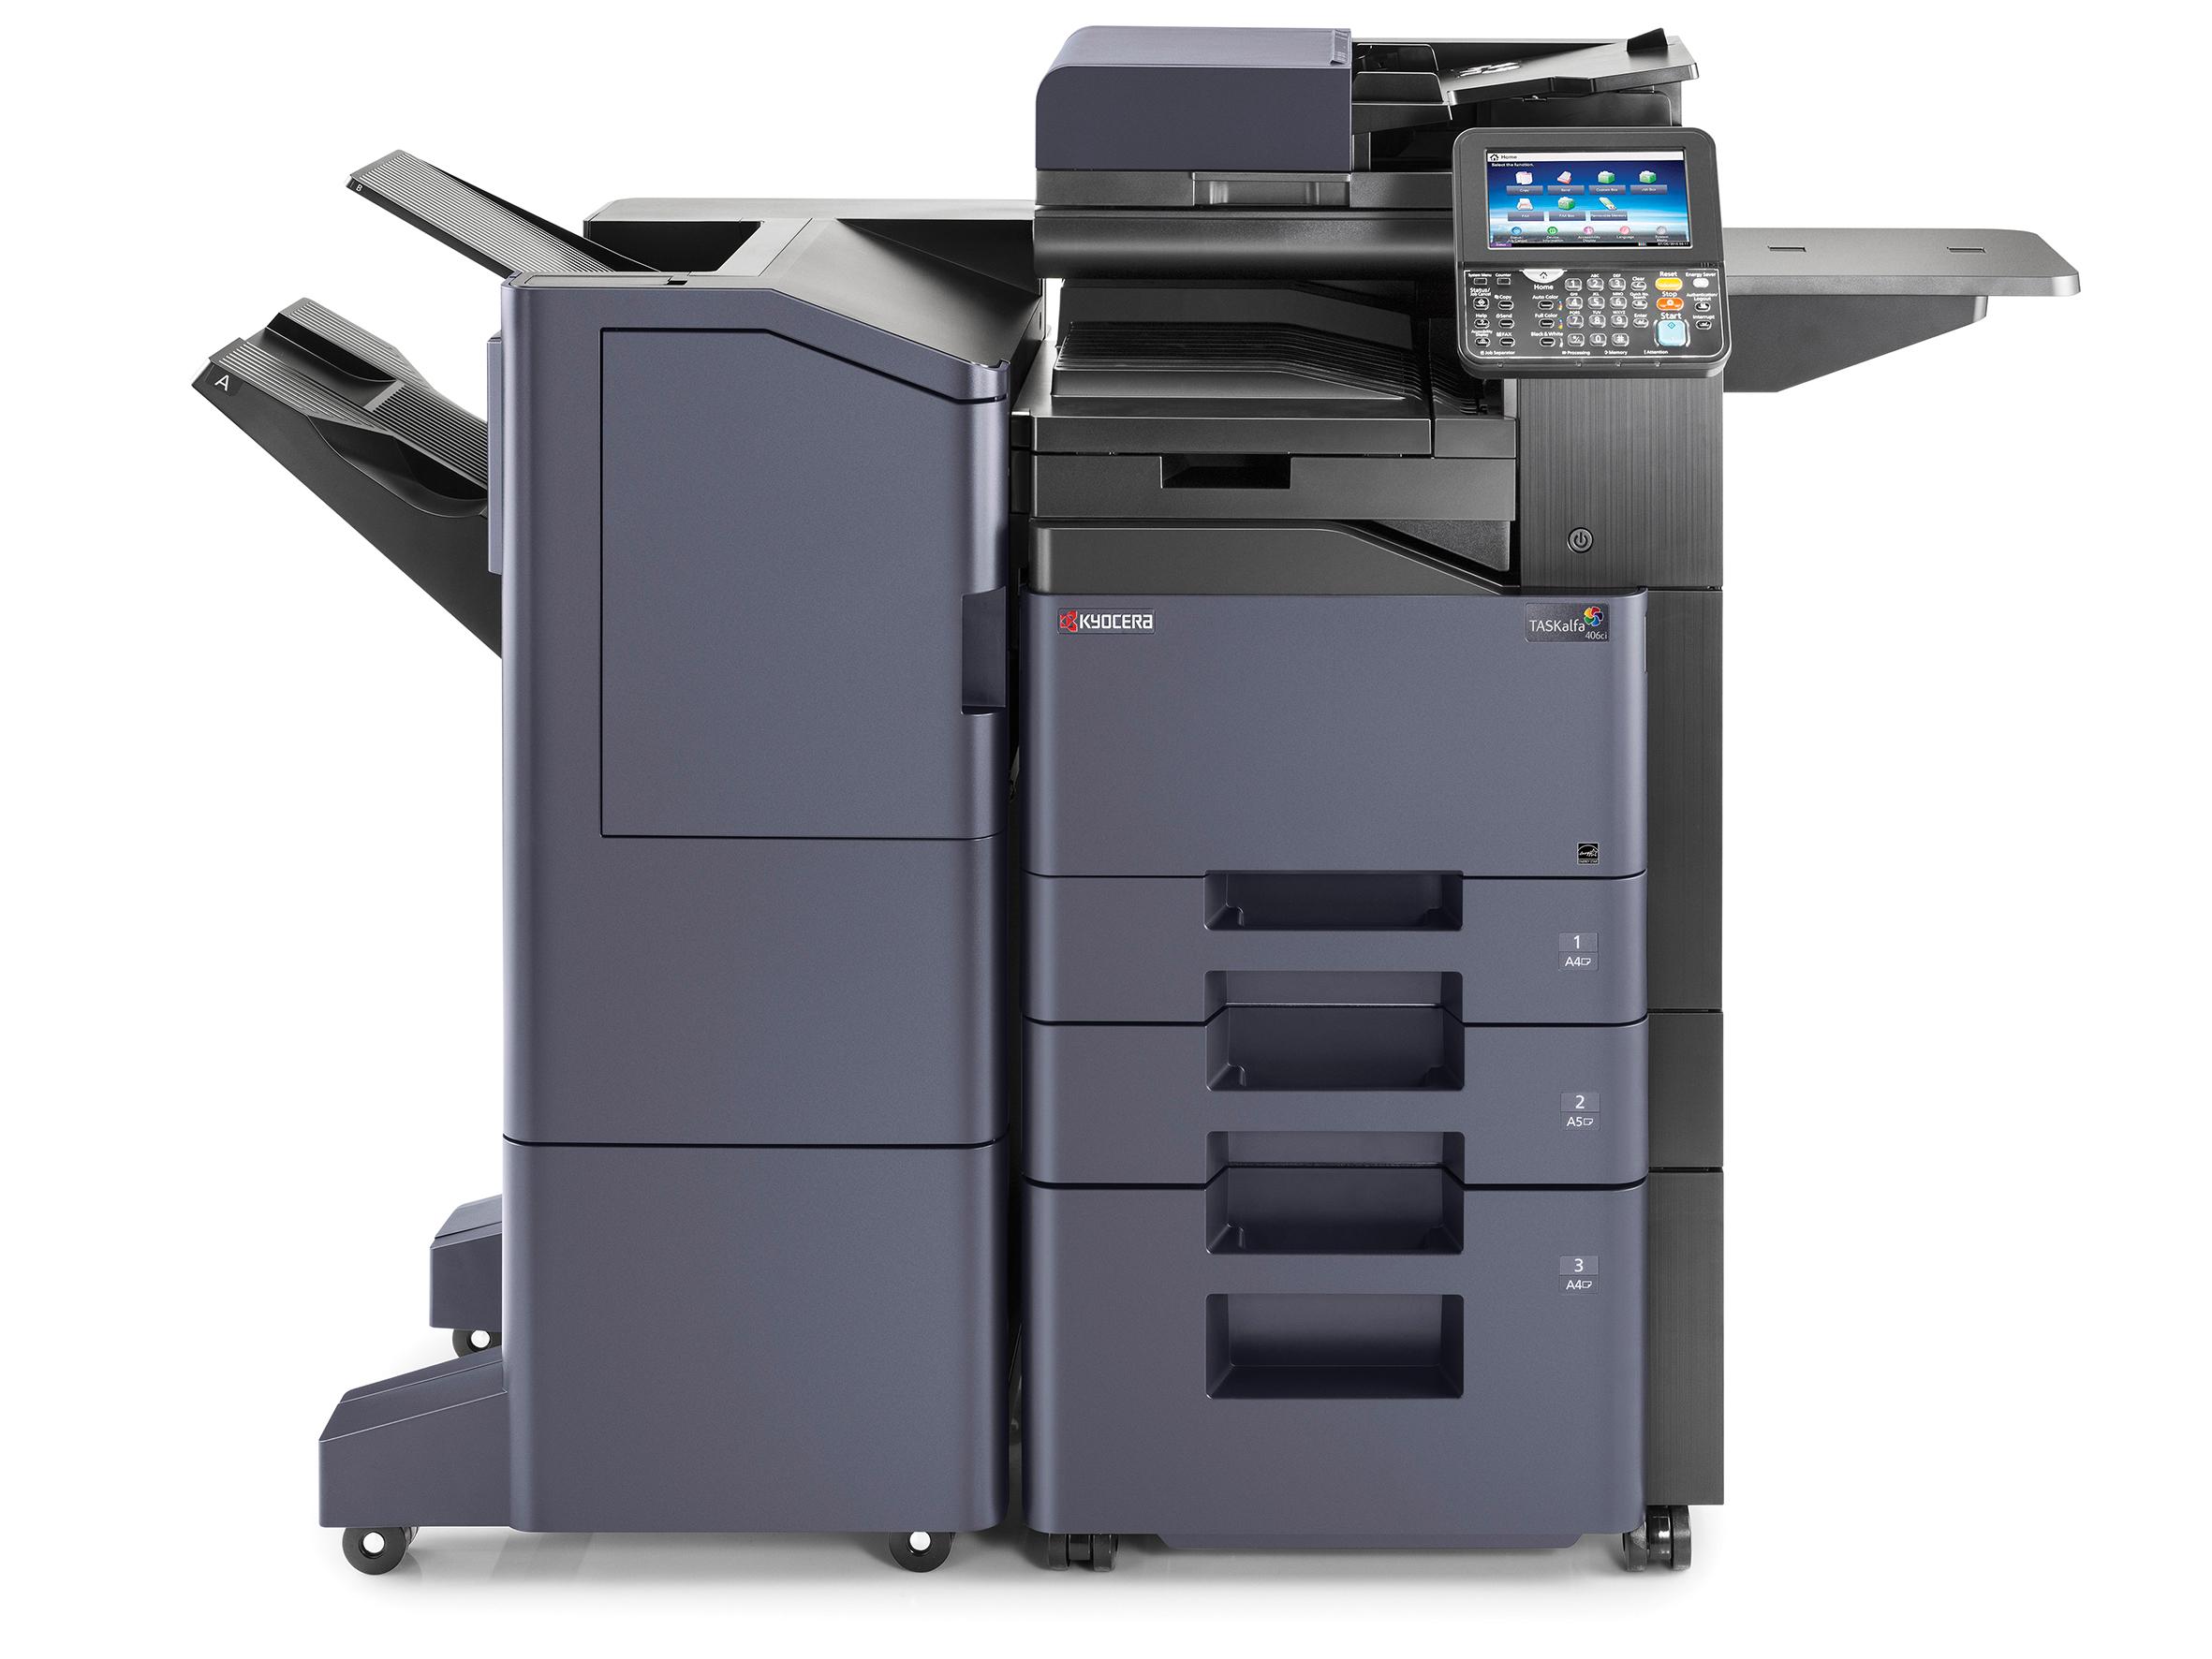 https://www.rhymebiz.com/sites/rhymebiz.com/assets/images/Kyocera-Printers/TASKalfa_406c.jpg